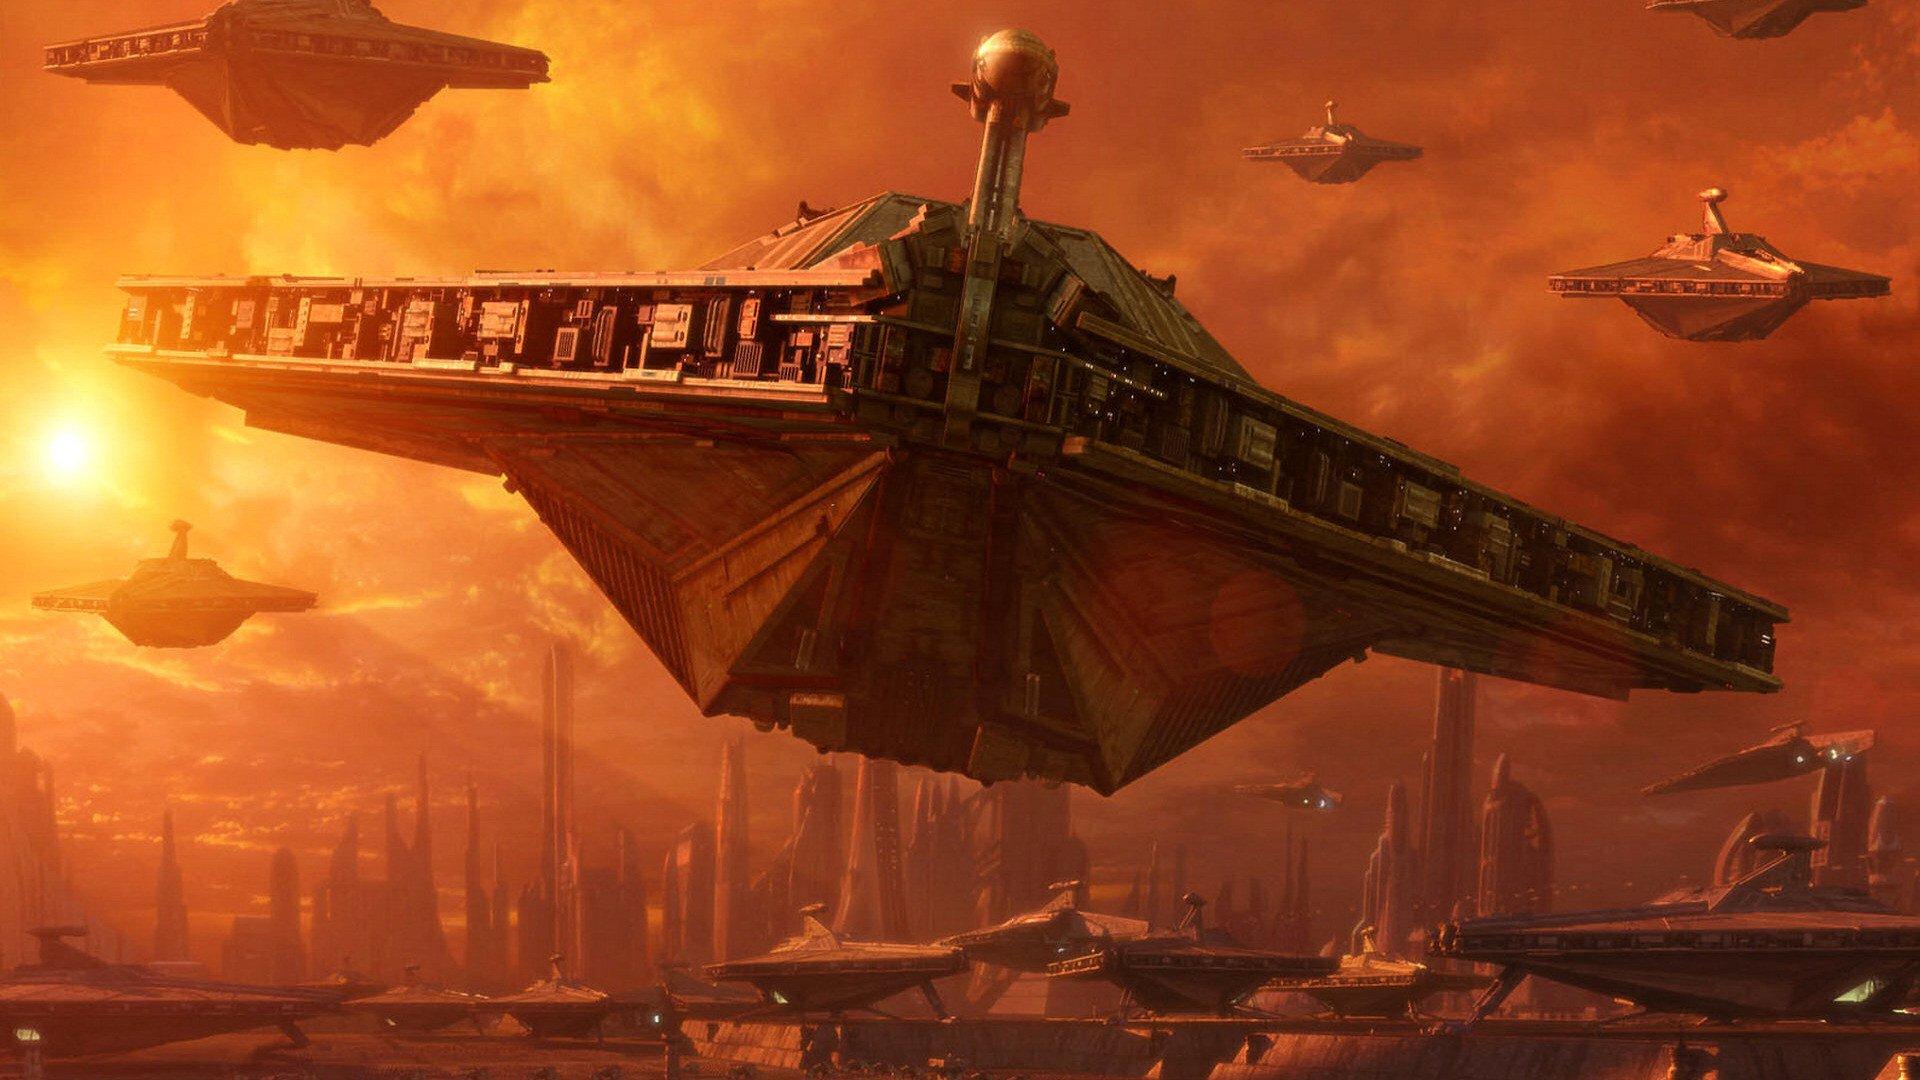 Sci Fi Clone : Star wars attack clones sci fi action futuristic movie